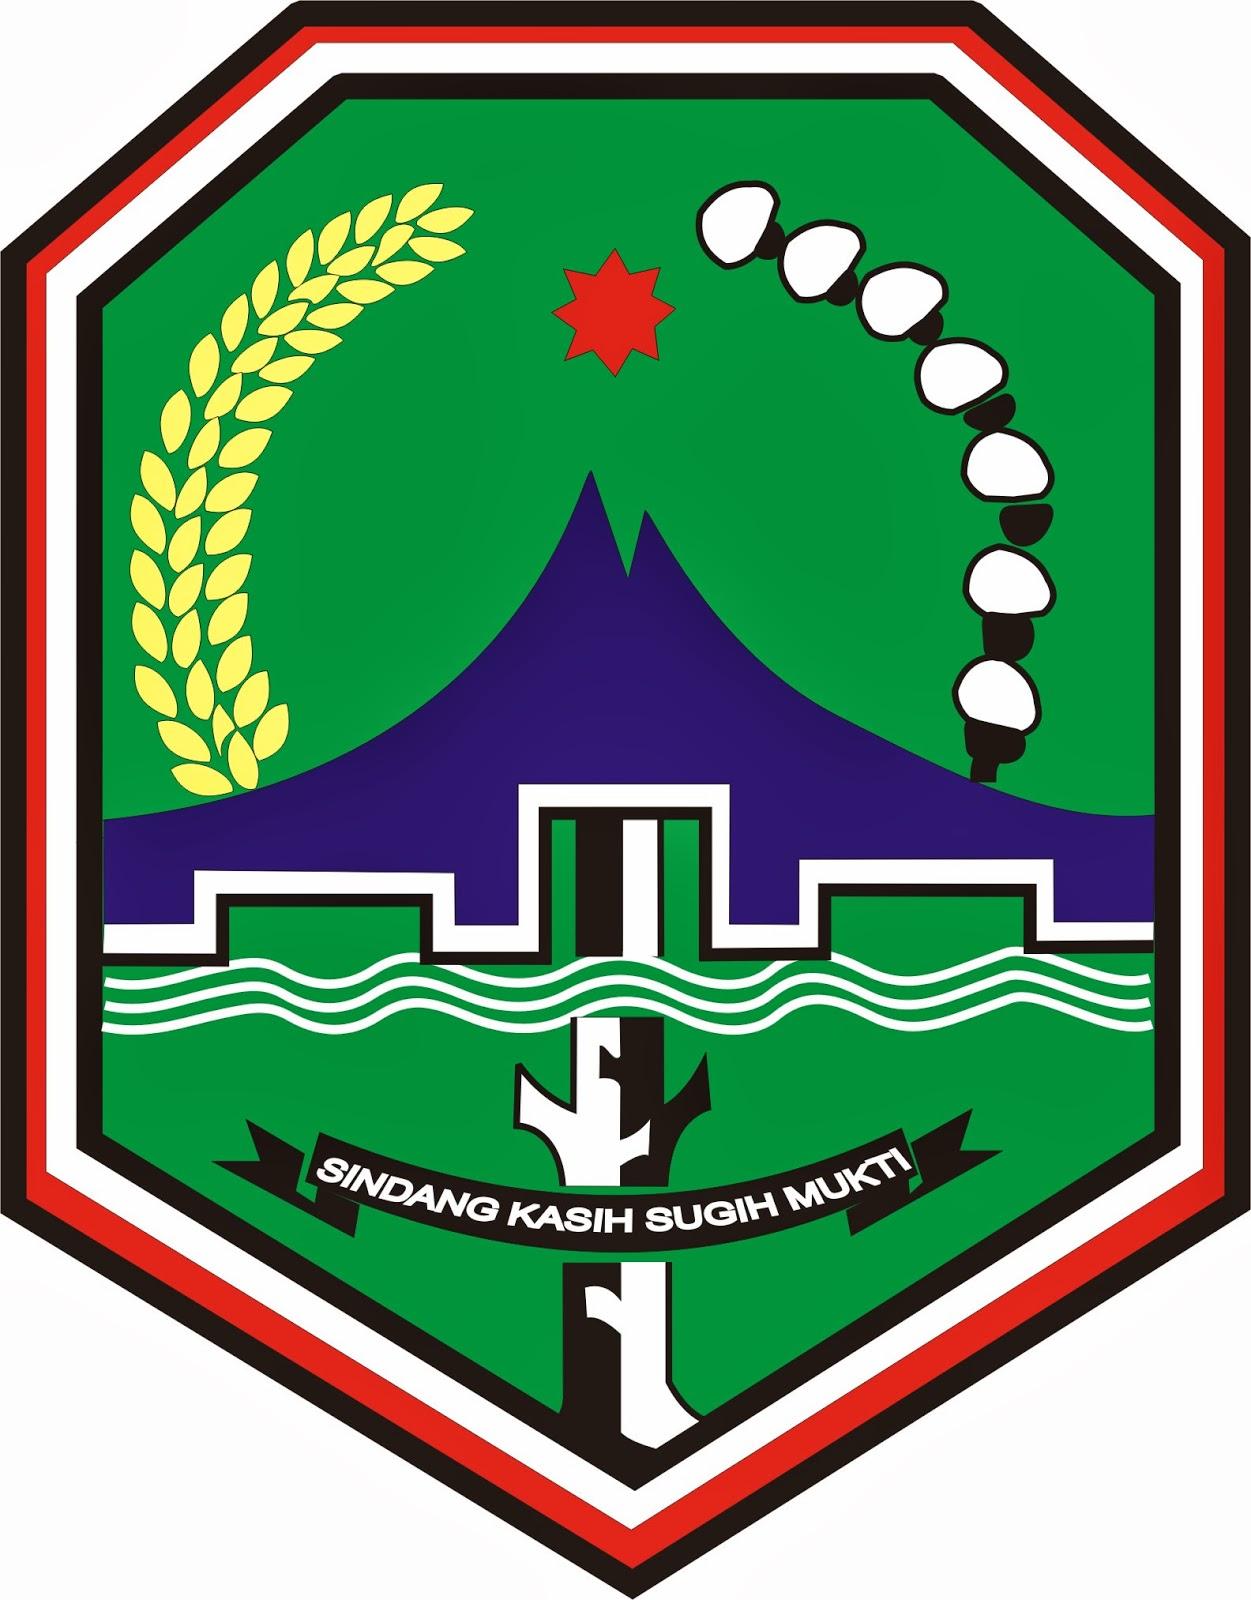 Logo Majalengka Png : majalengka, Majalengka